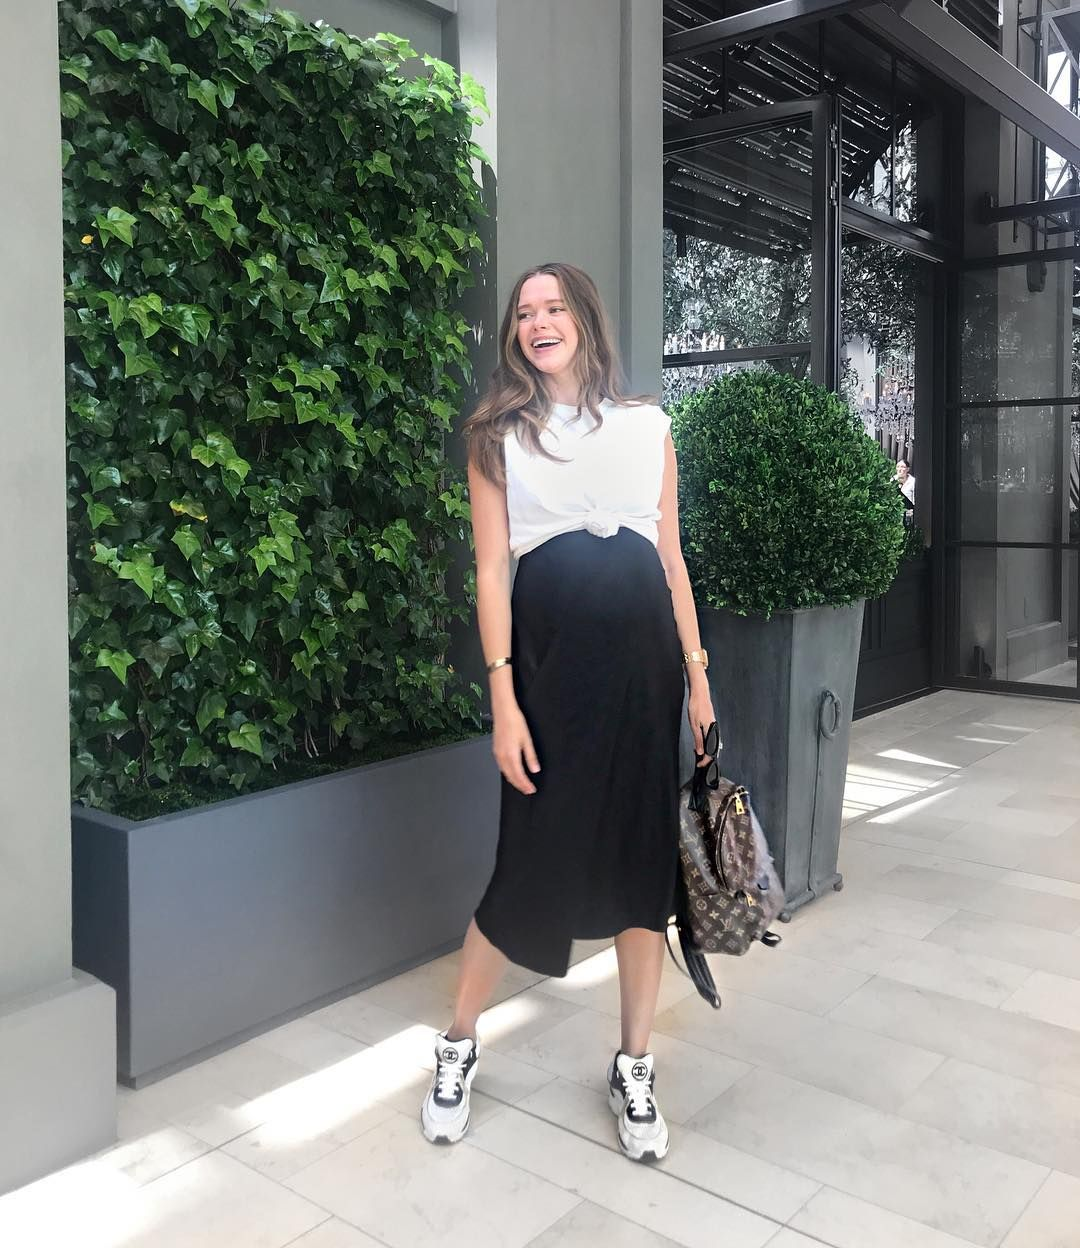 "Valeria Lipovetsky on Instagram: ""Took a break from my anti social pregnancy 👏🏻💃🏻 #ootd"""